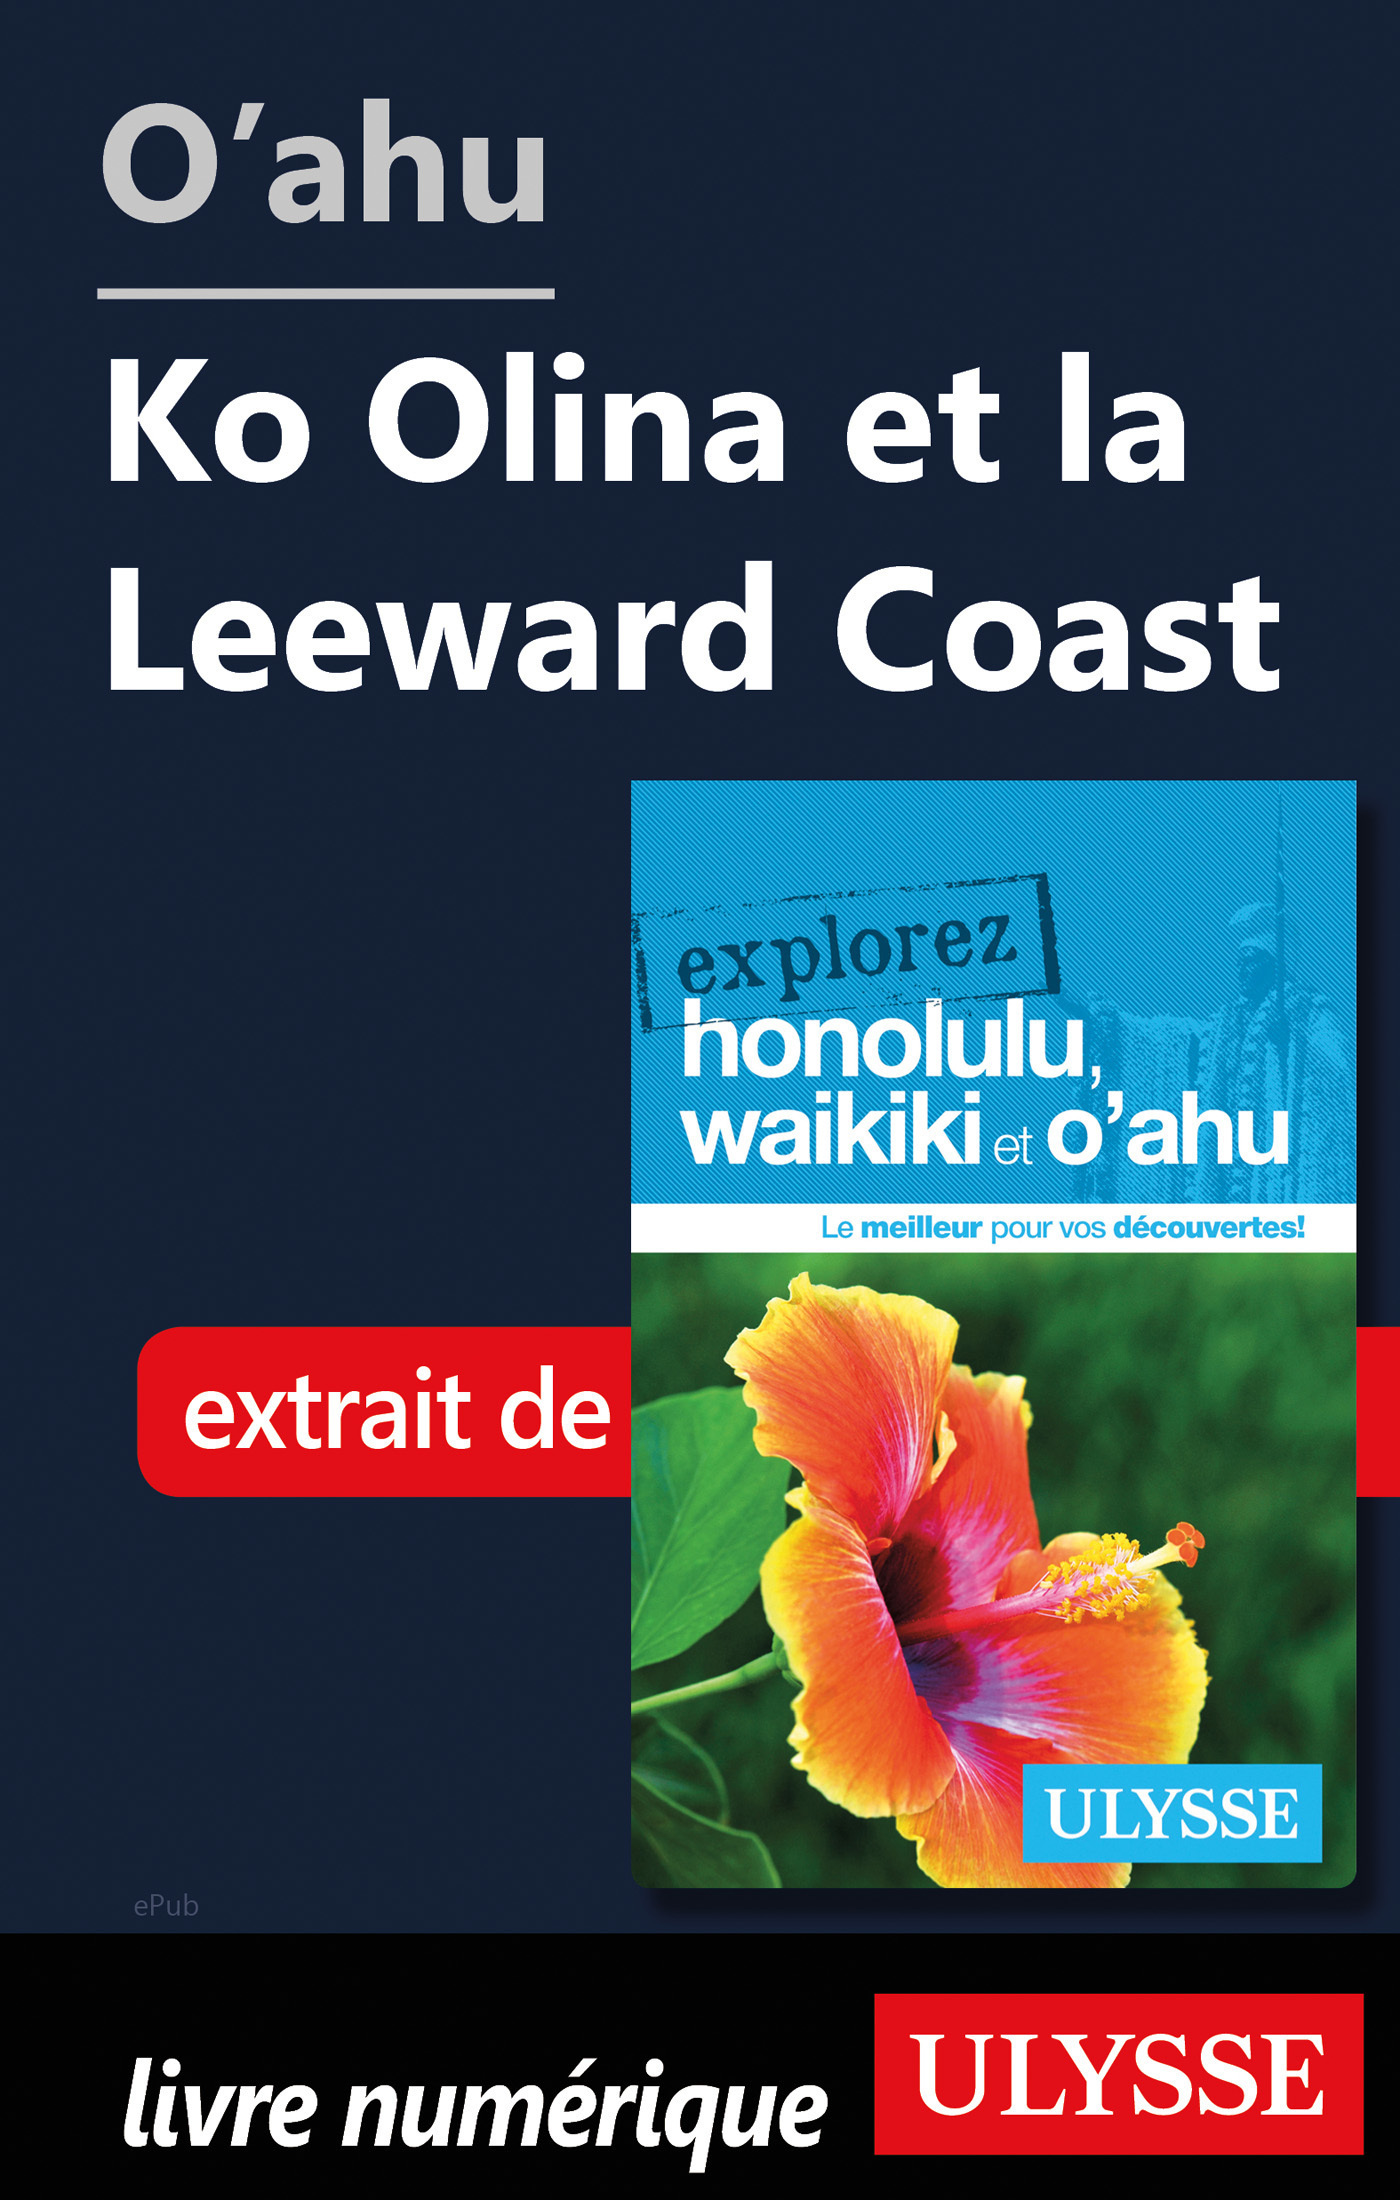 O'ahu - Ko Olina et la Leeward Coast